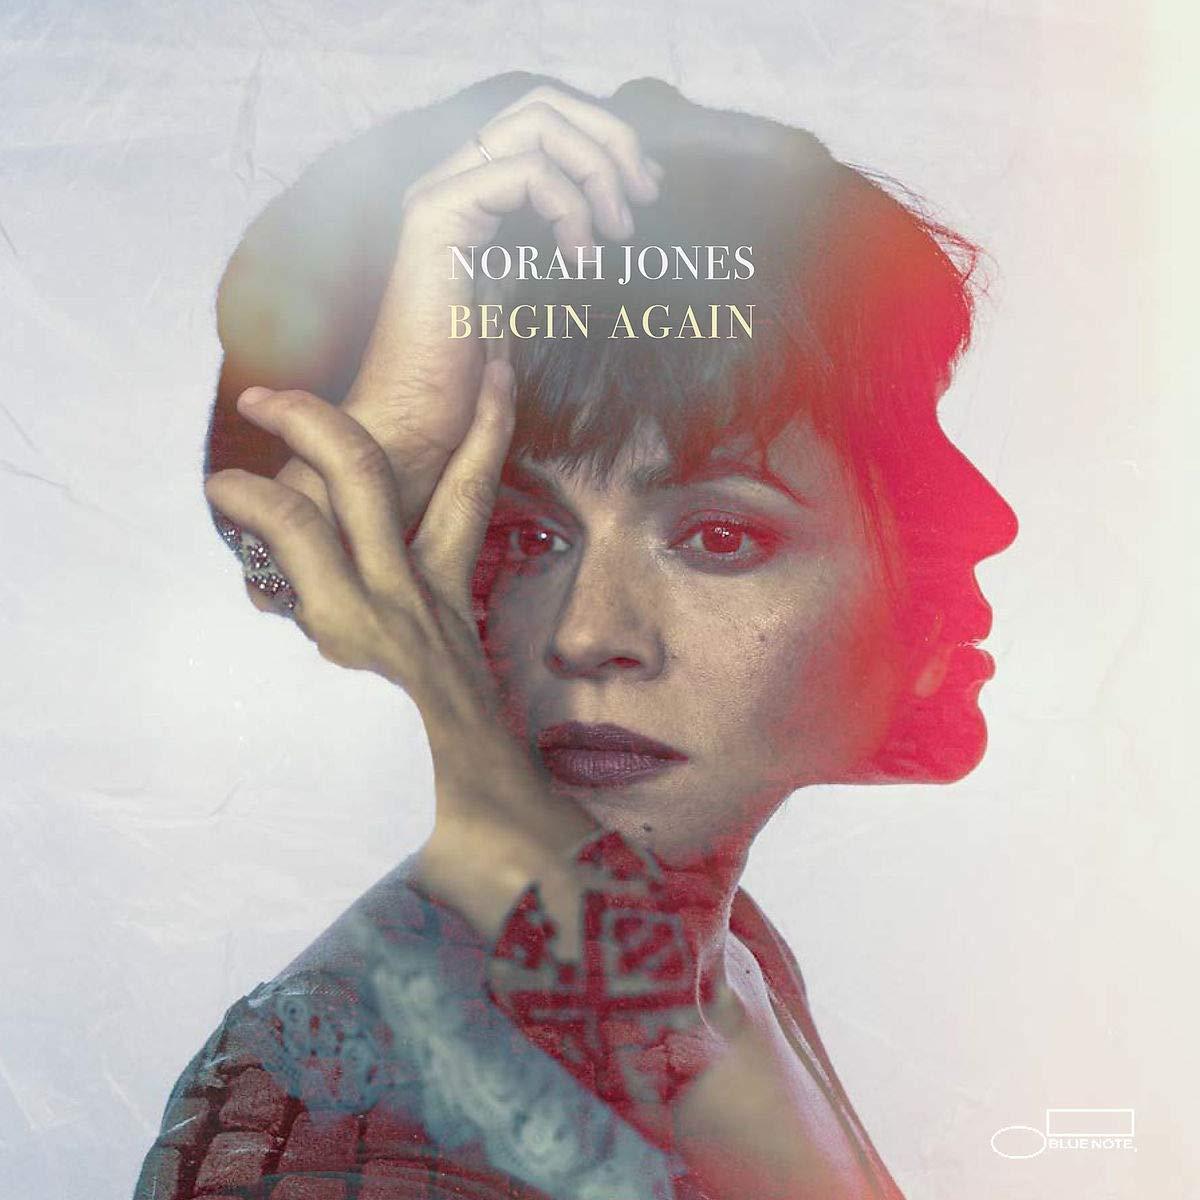 Copertina Vinile 33 giri Begin Again di Norah Jones